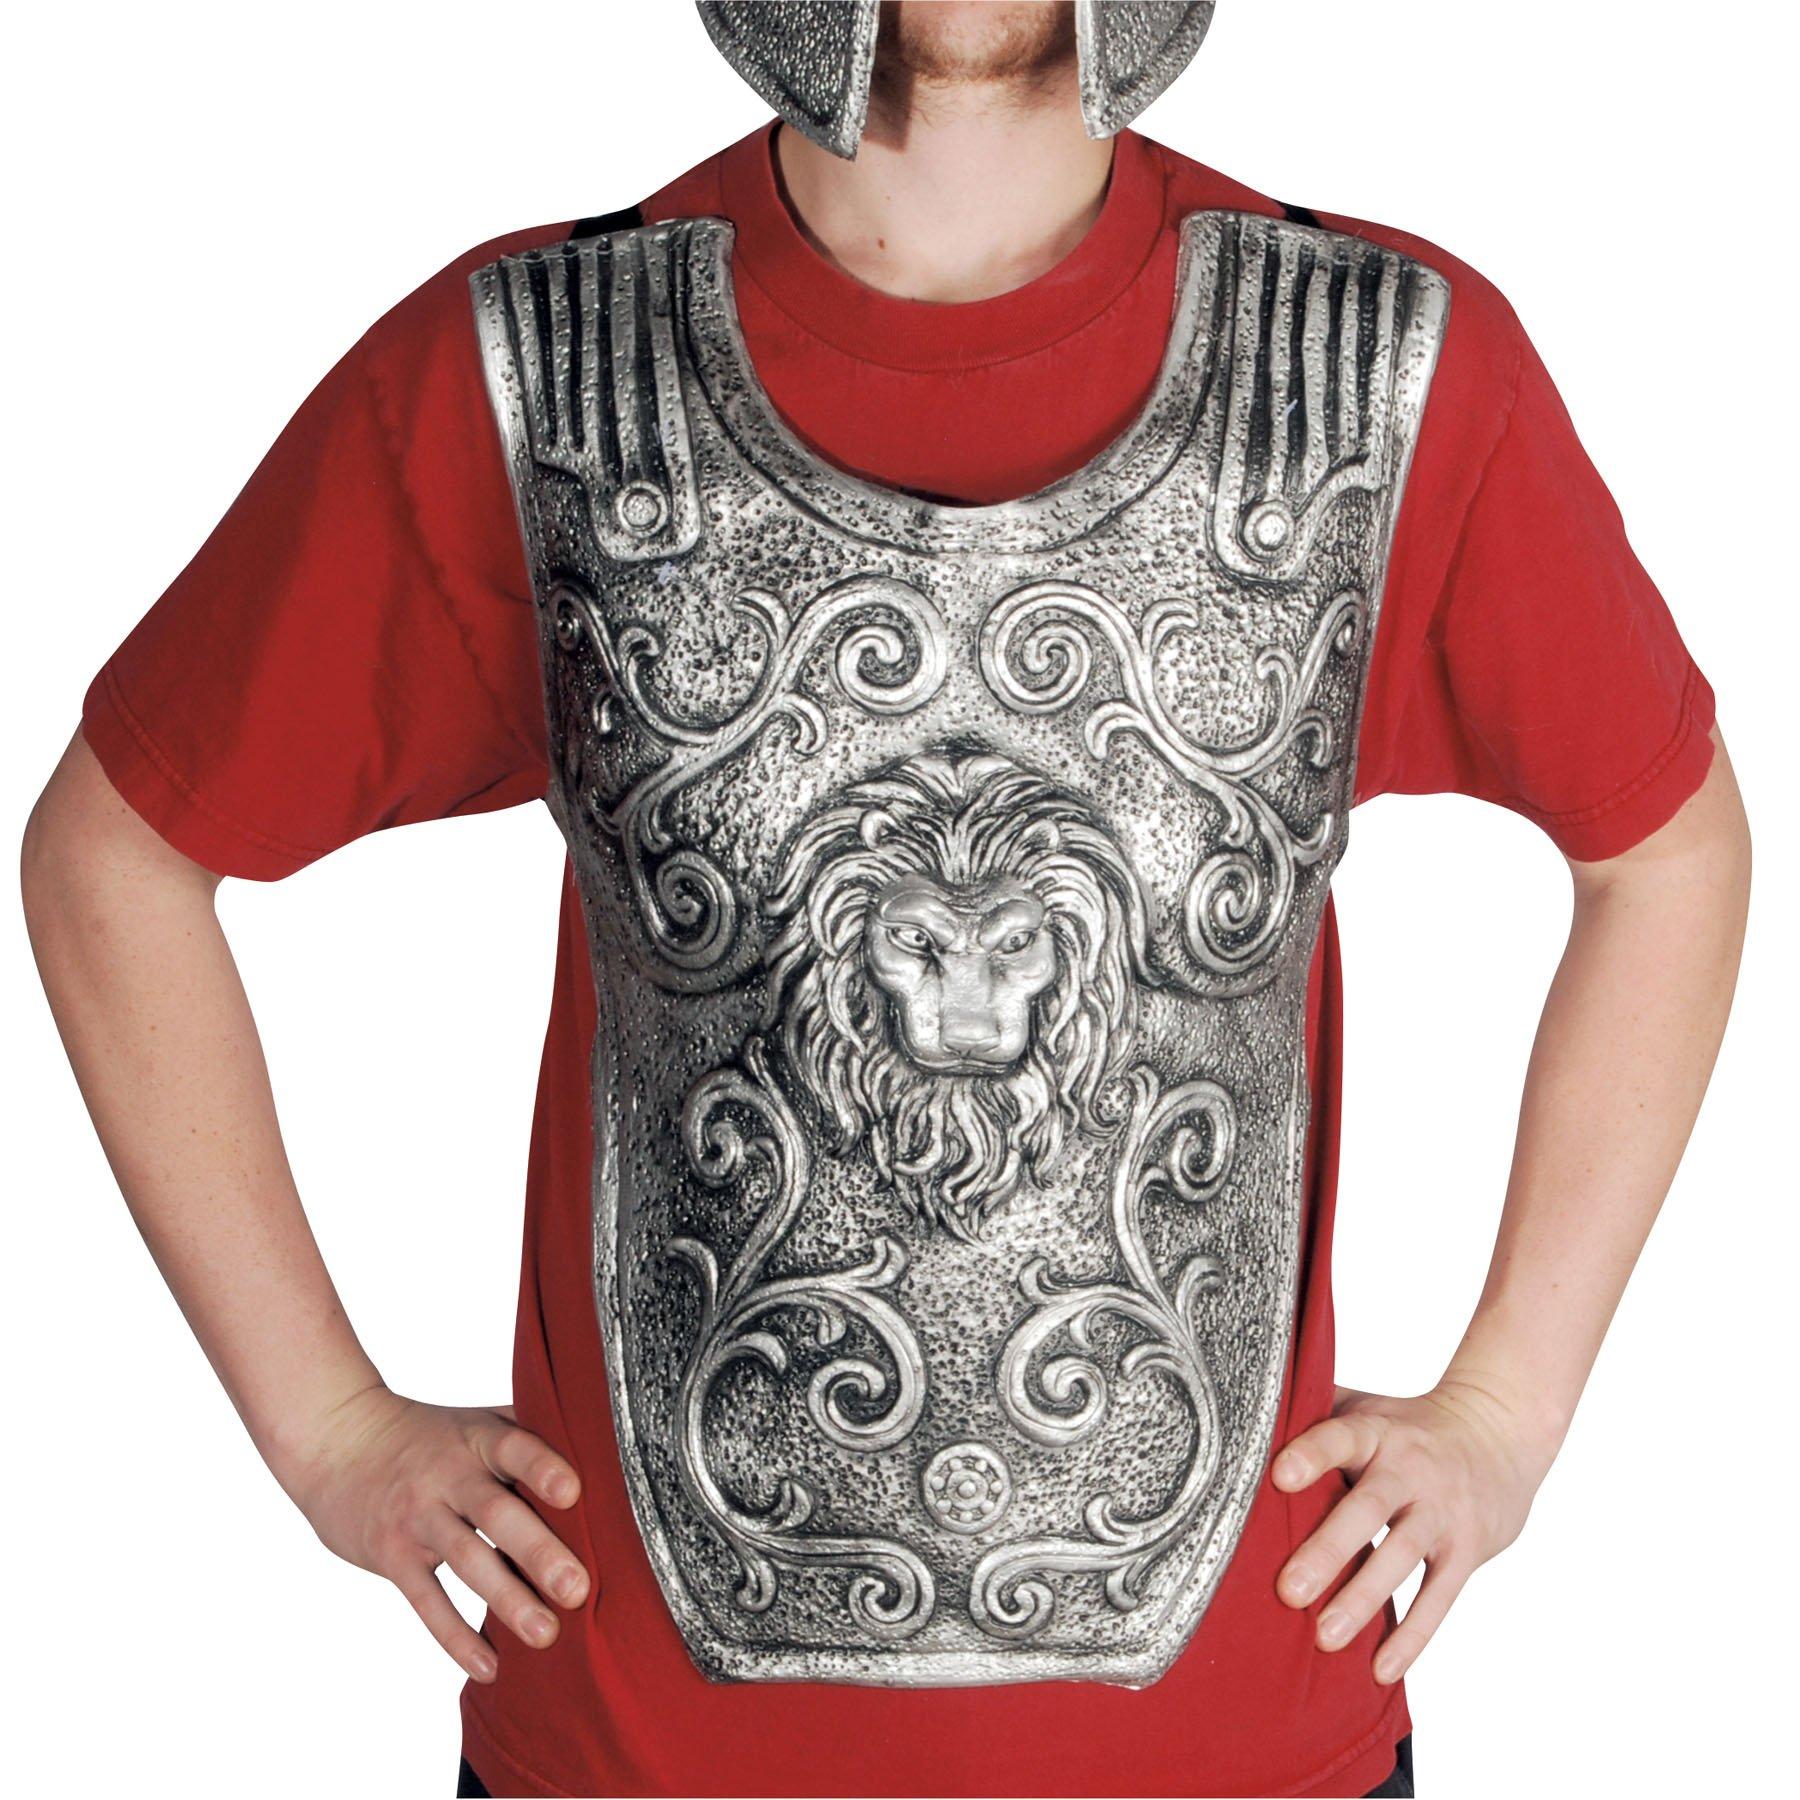 Loftus International Roman Legion Warrior Battle Chest Plate, Silver, One Size by Loftus International